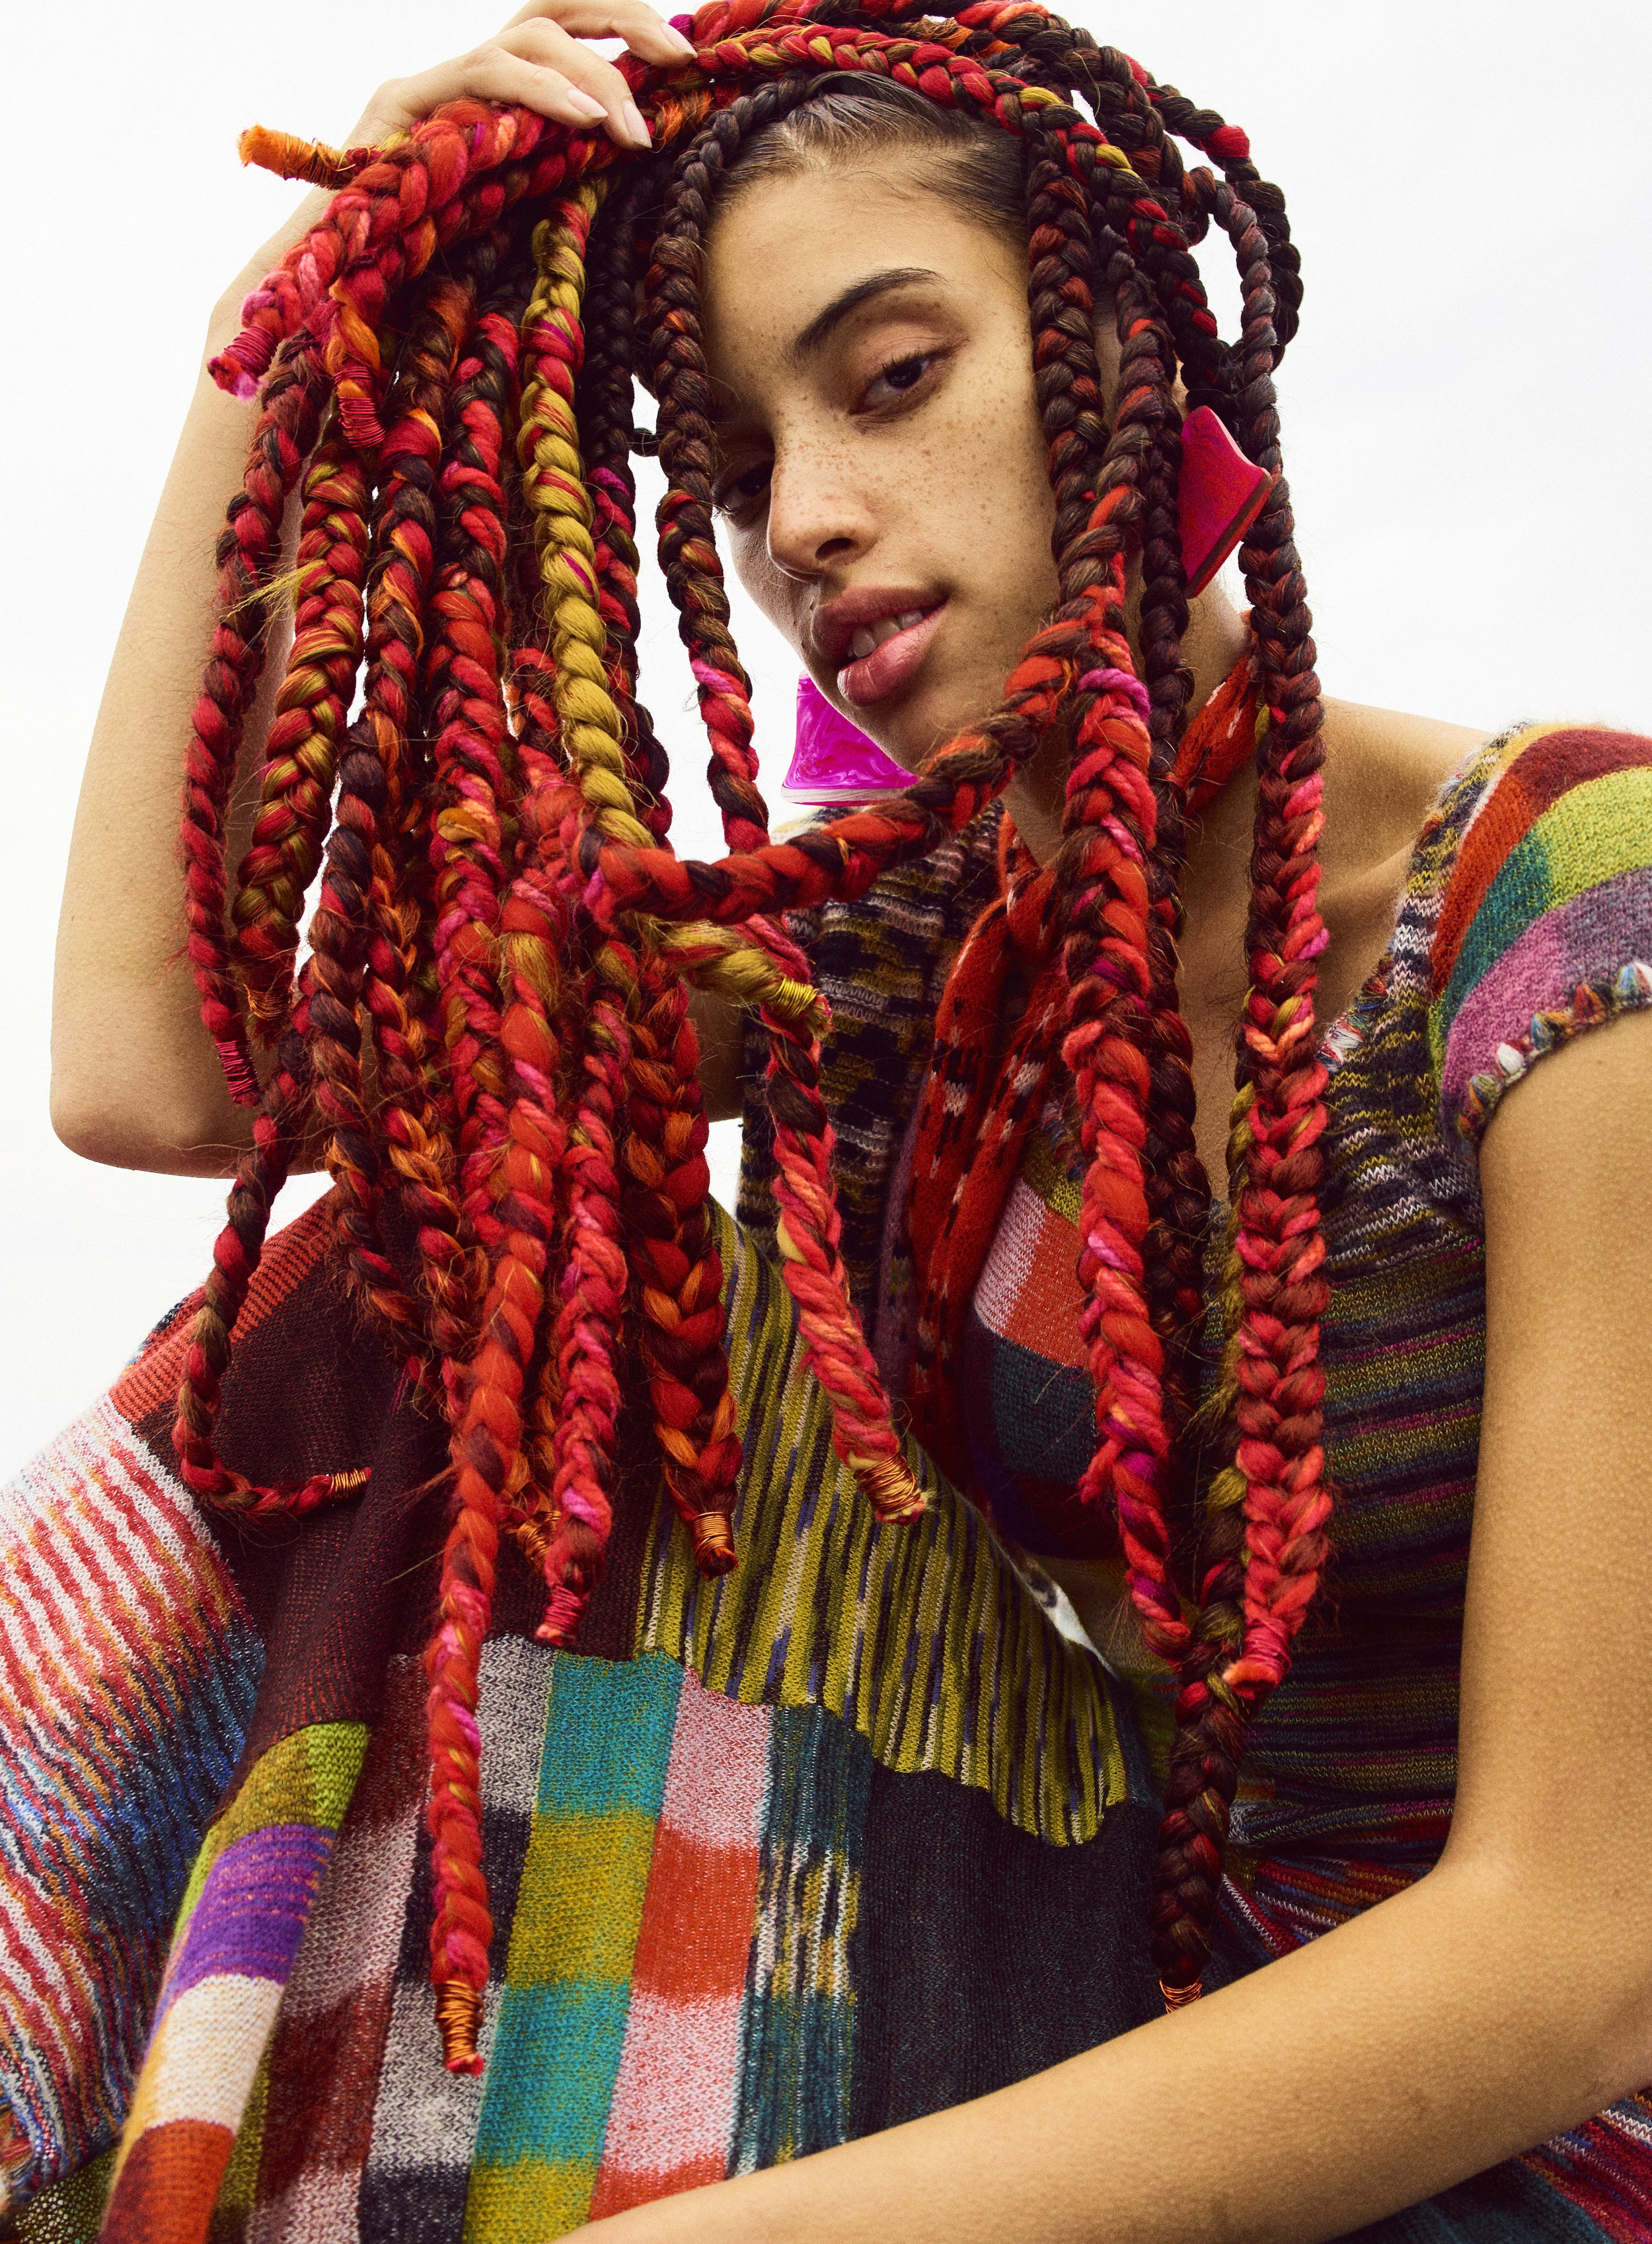 Khadija by Greg Harris and Katie Burnett